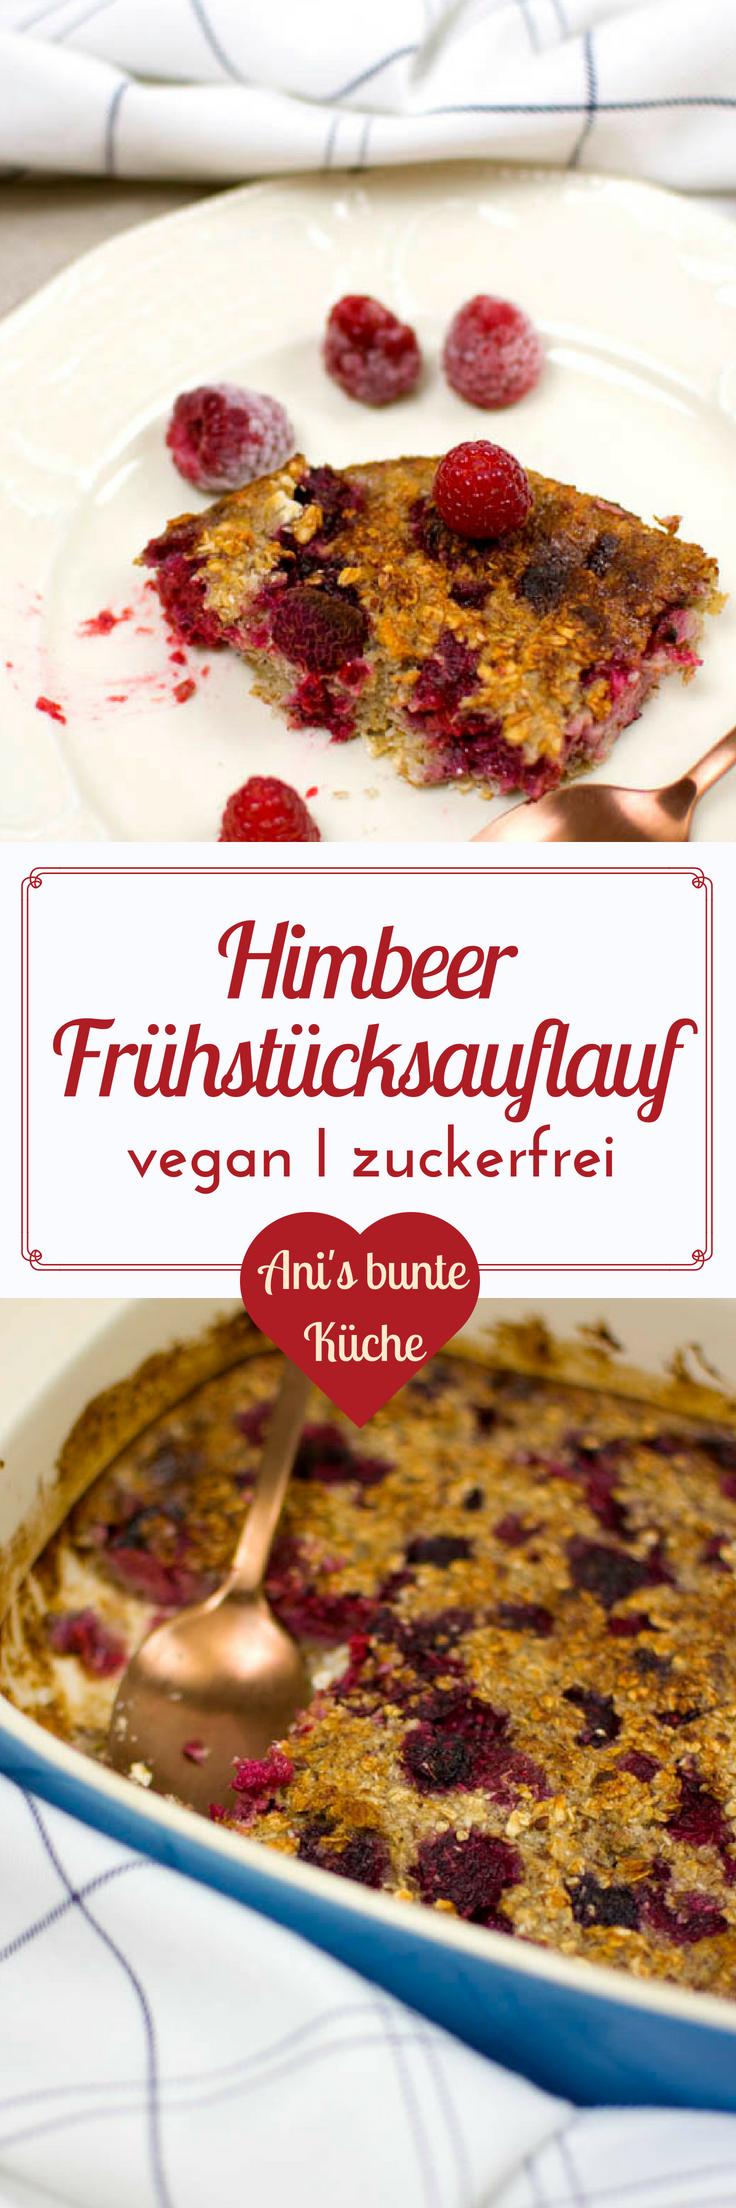 Himbeer Kokos Oatmeal Bake schmeckt wie Himbeerkuchen mit Streuseln zum Frühstück.